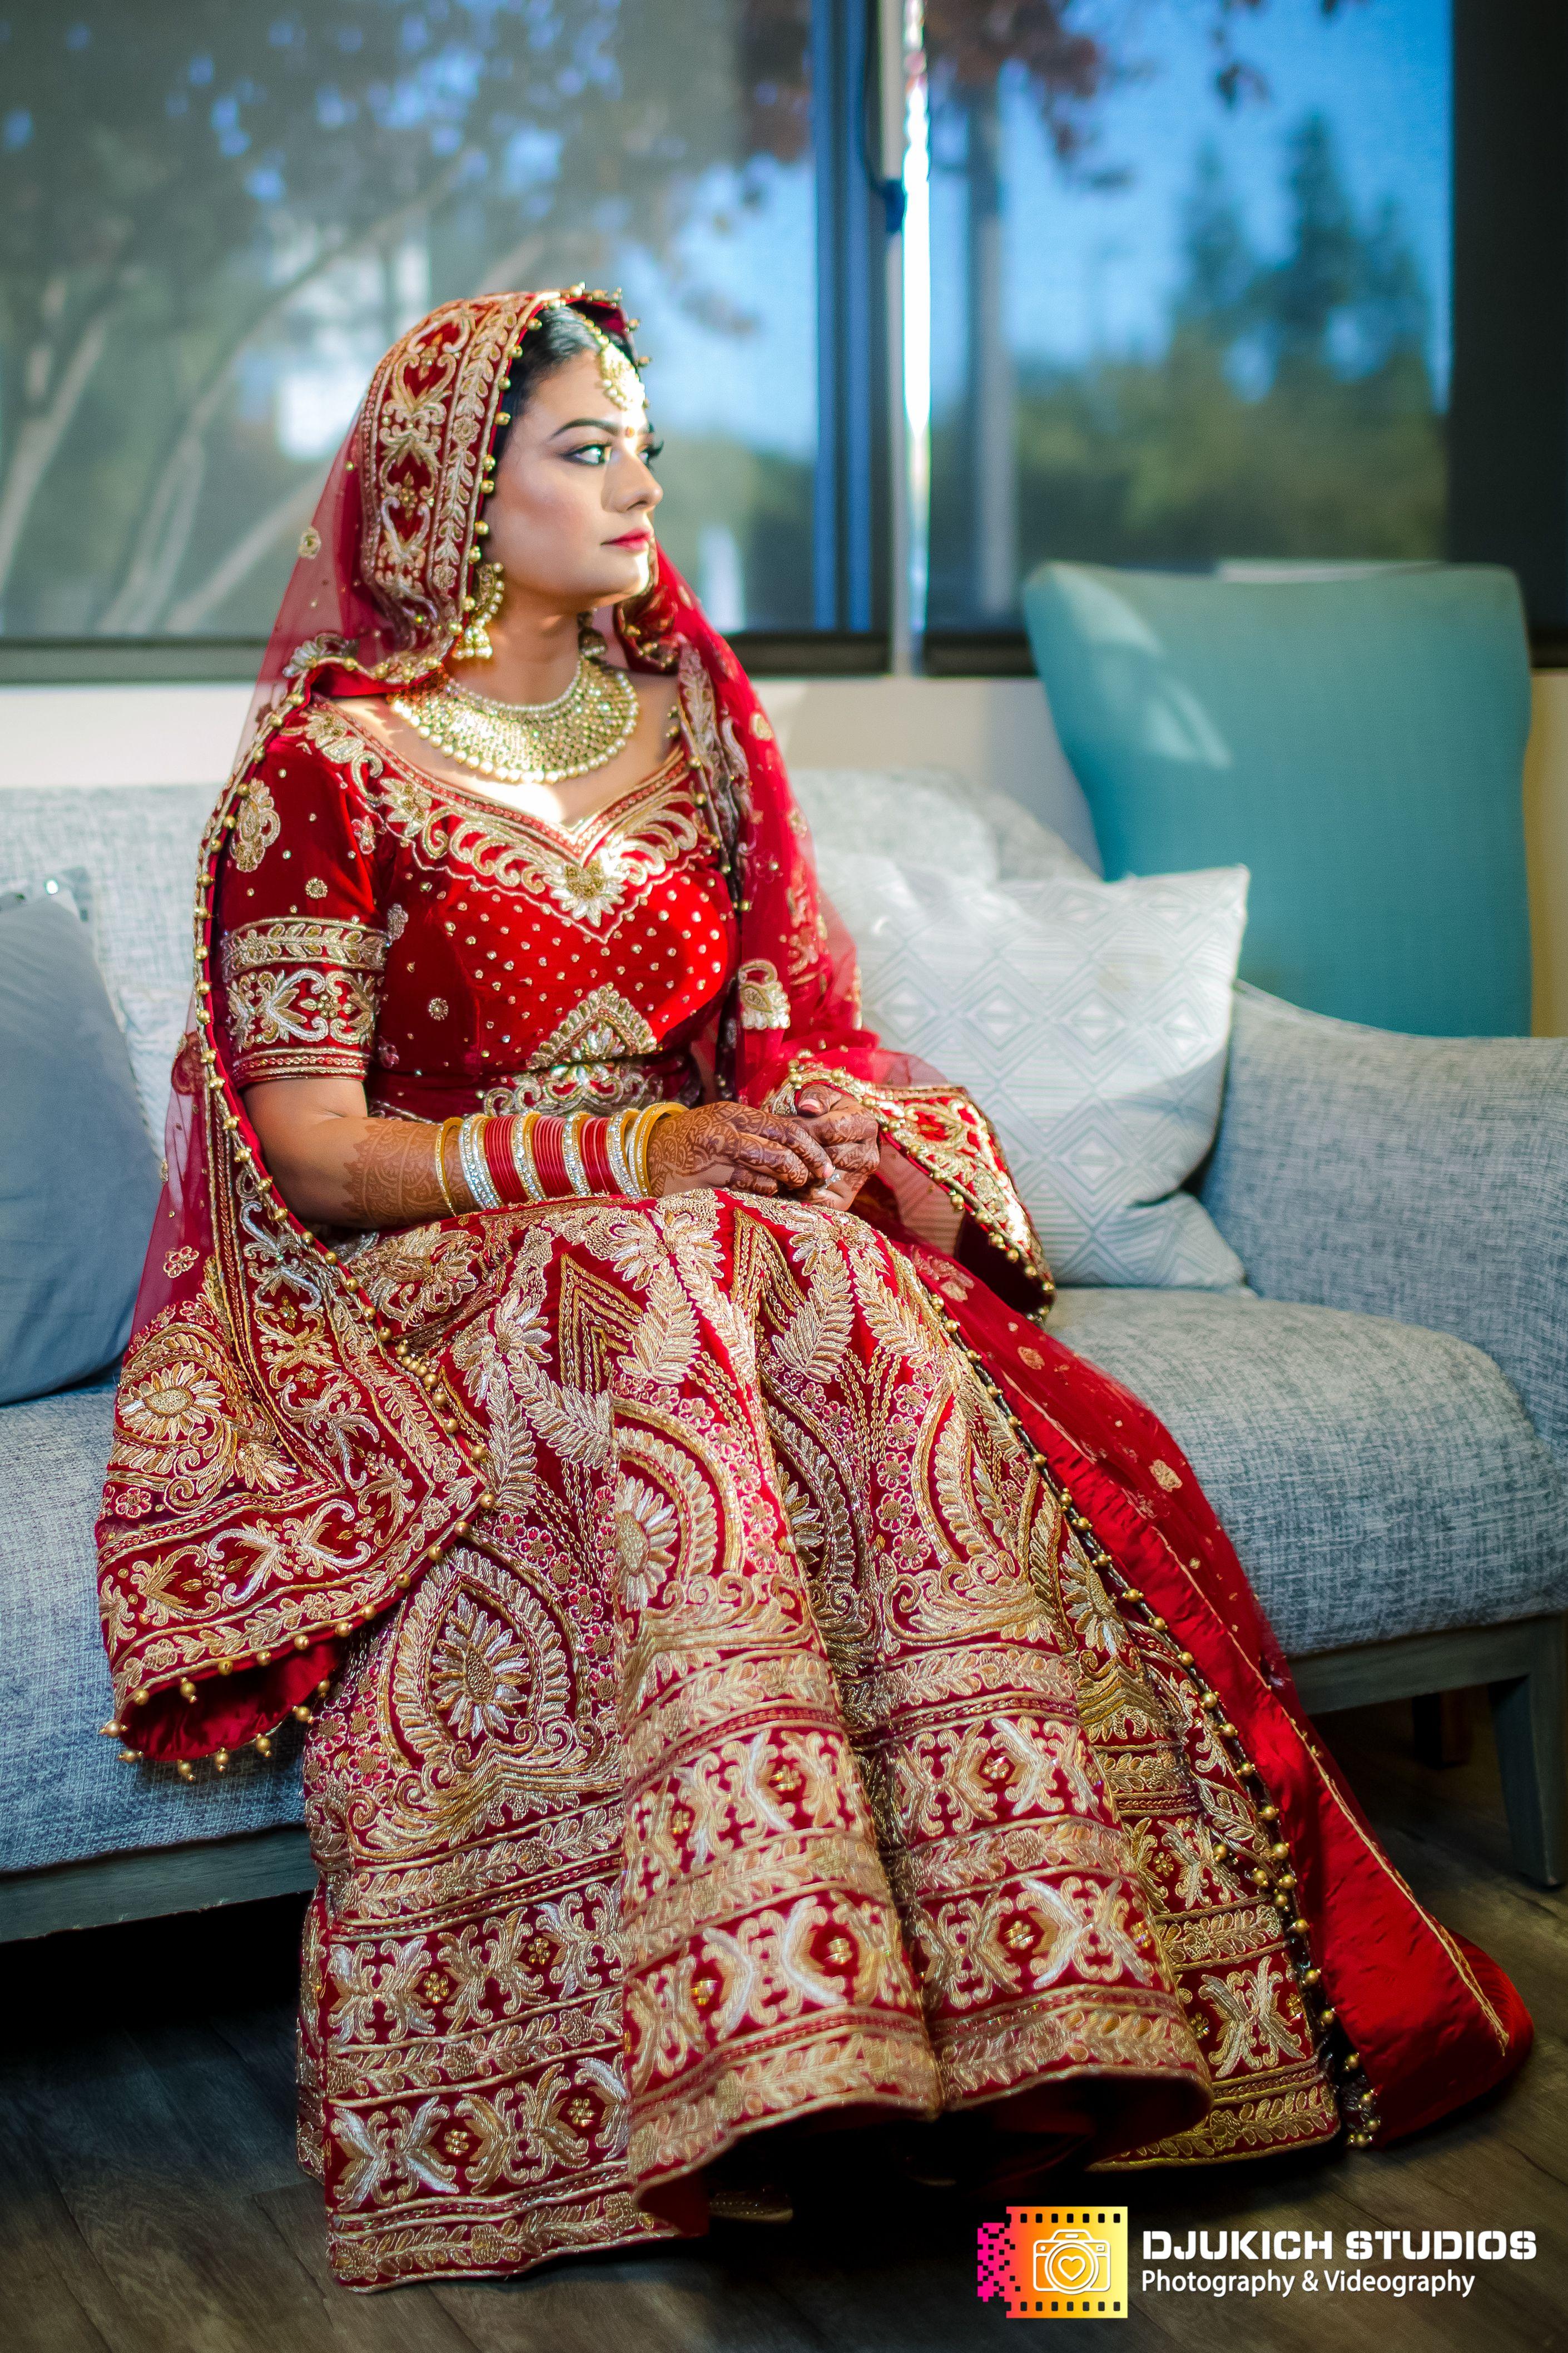 Wedding Day Wedding Photography Wedding Videography Indian Bride Indian Wedding Wedding Video Wedding Highlight Video Indian Bride Bride Indian Wedding